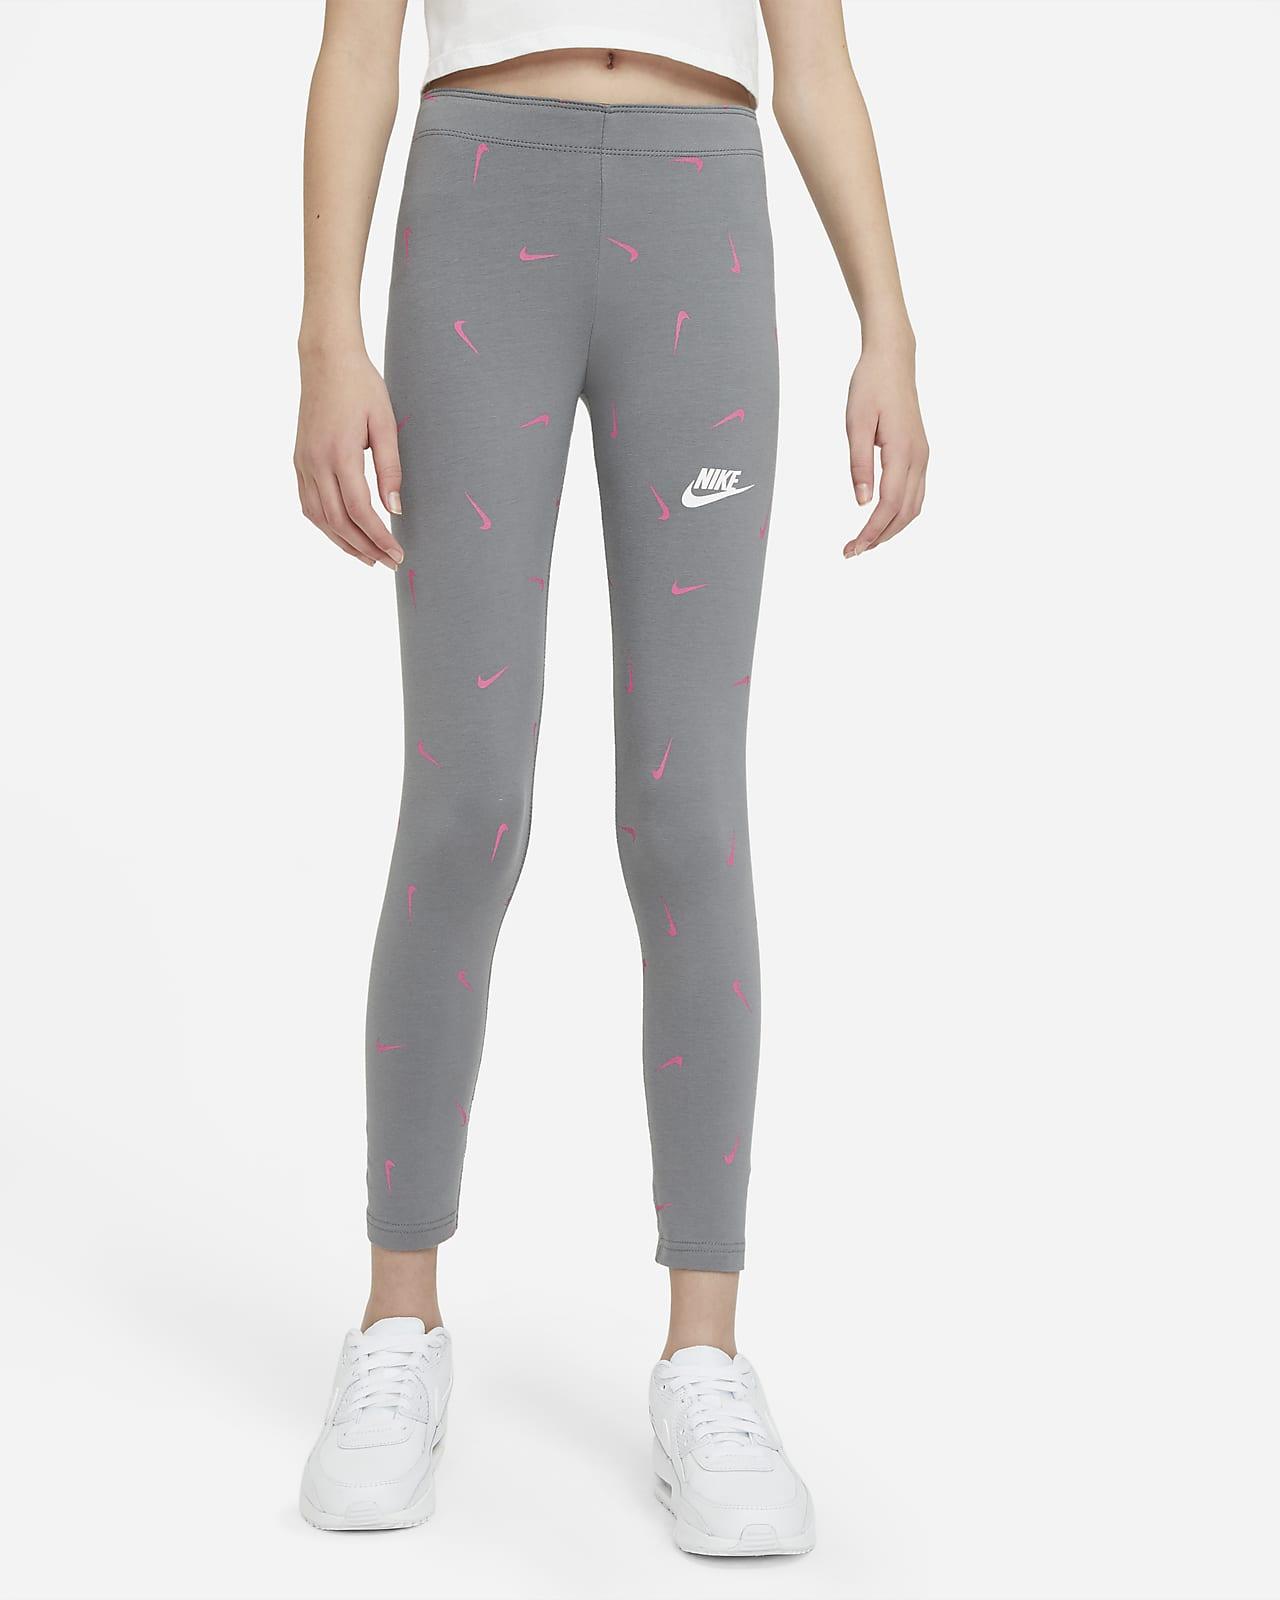 Nike Sportswear Older Kids' (Girls') Printed Leggings